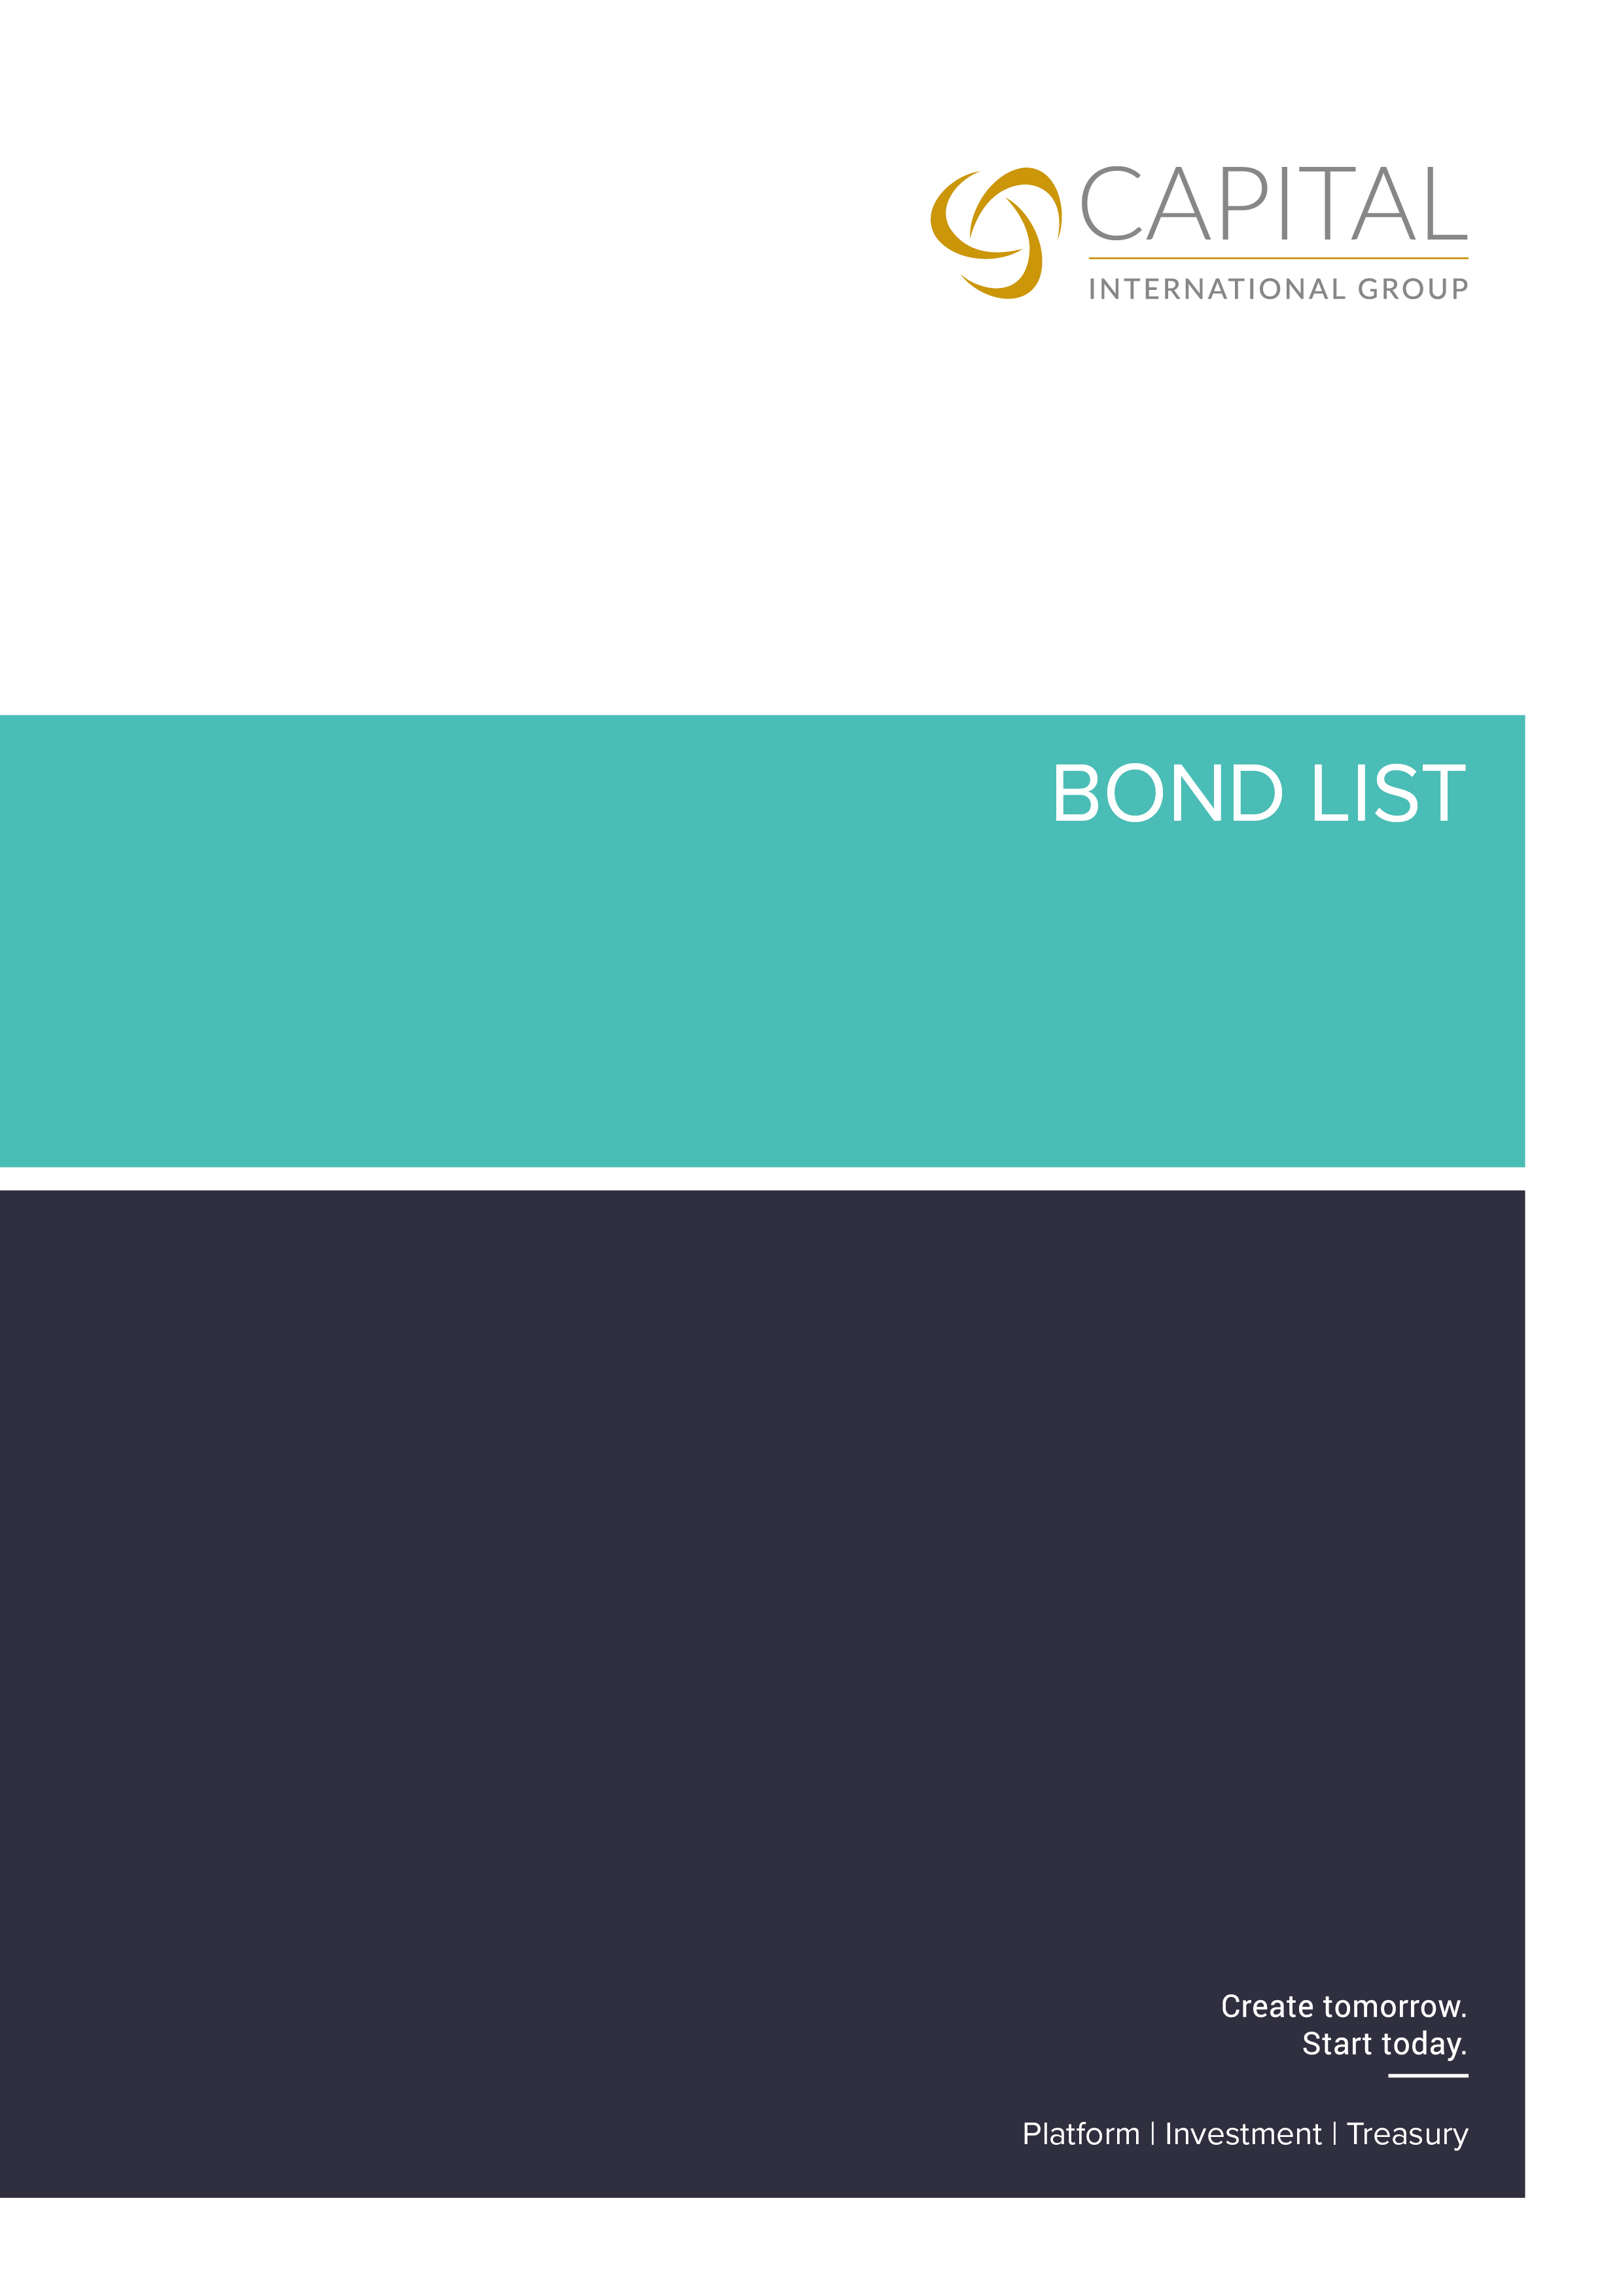 Bond List July 2020